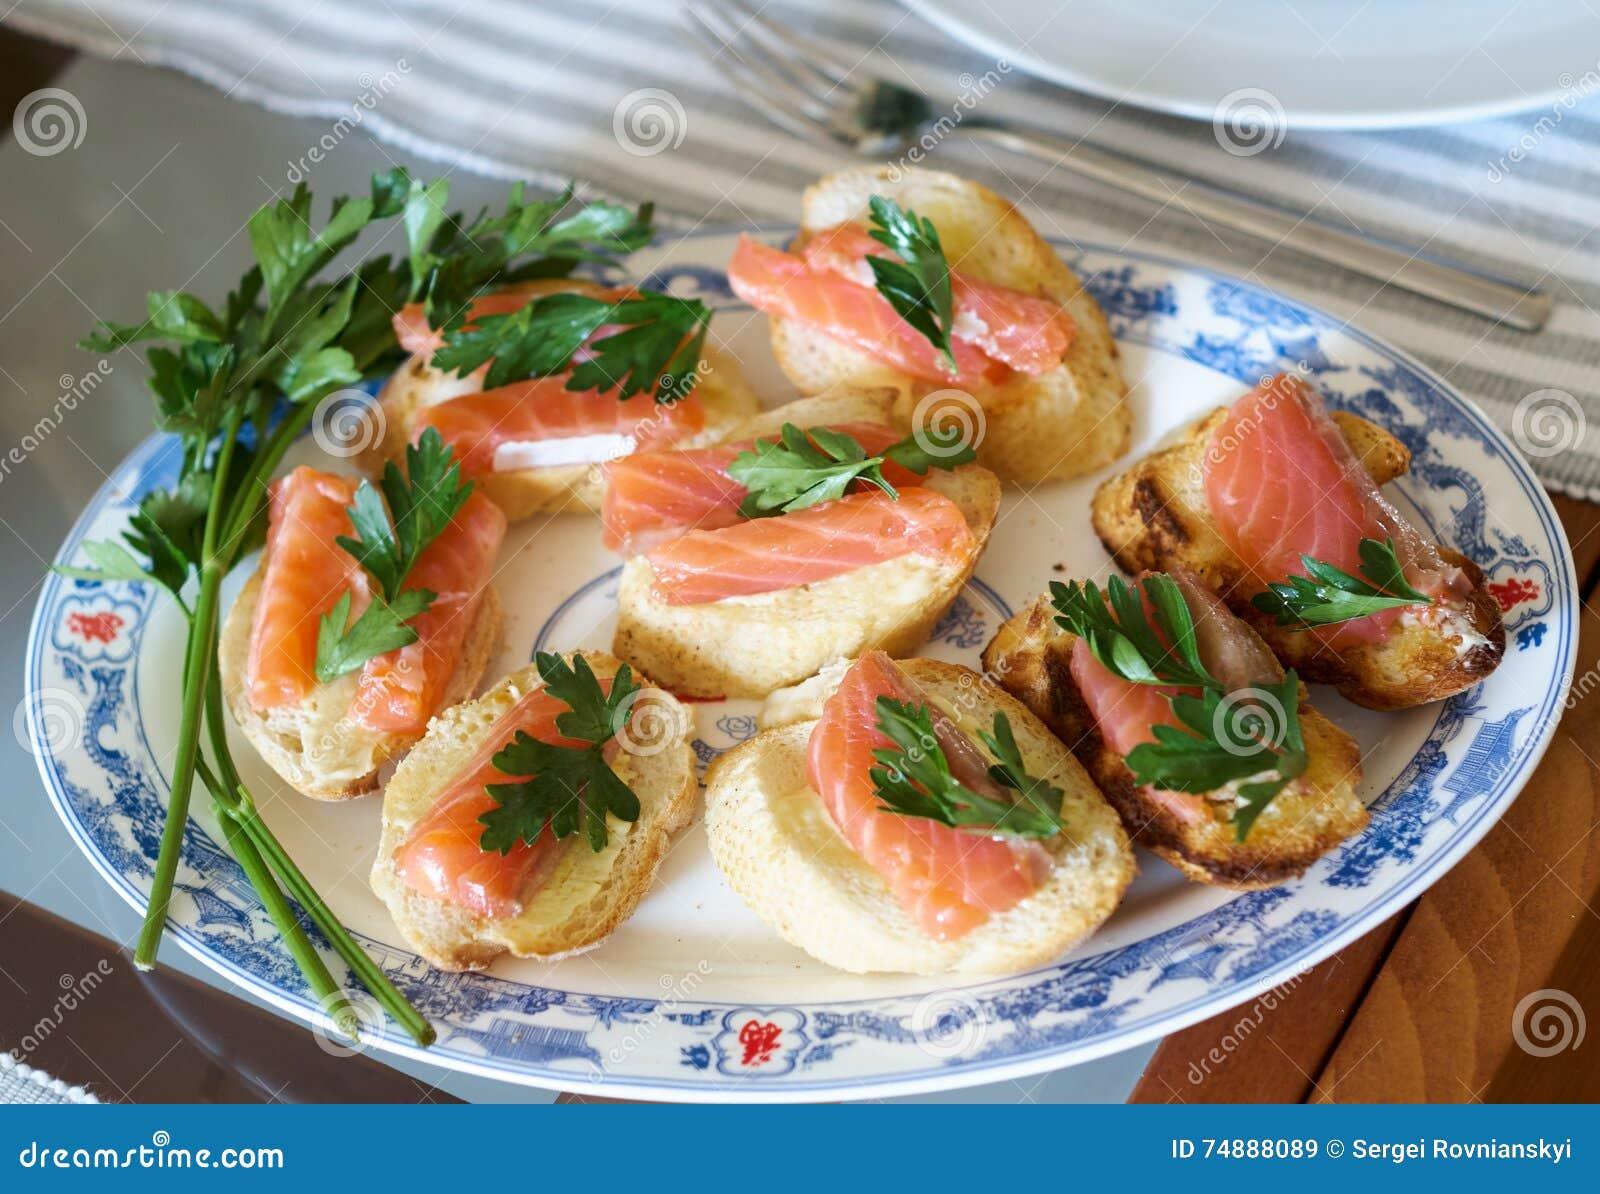 Sanduíche com peixes vermelhos canape salmon na tabela de bufete